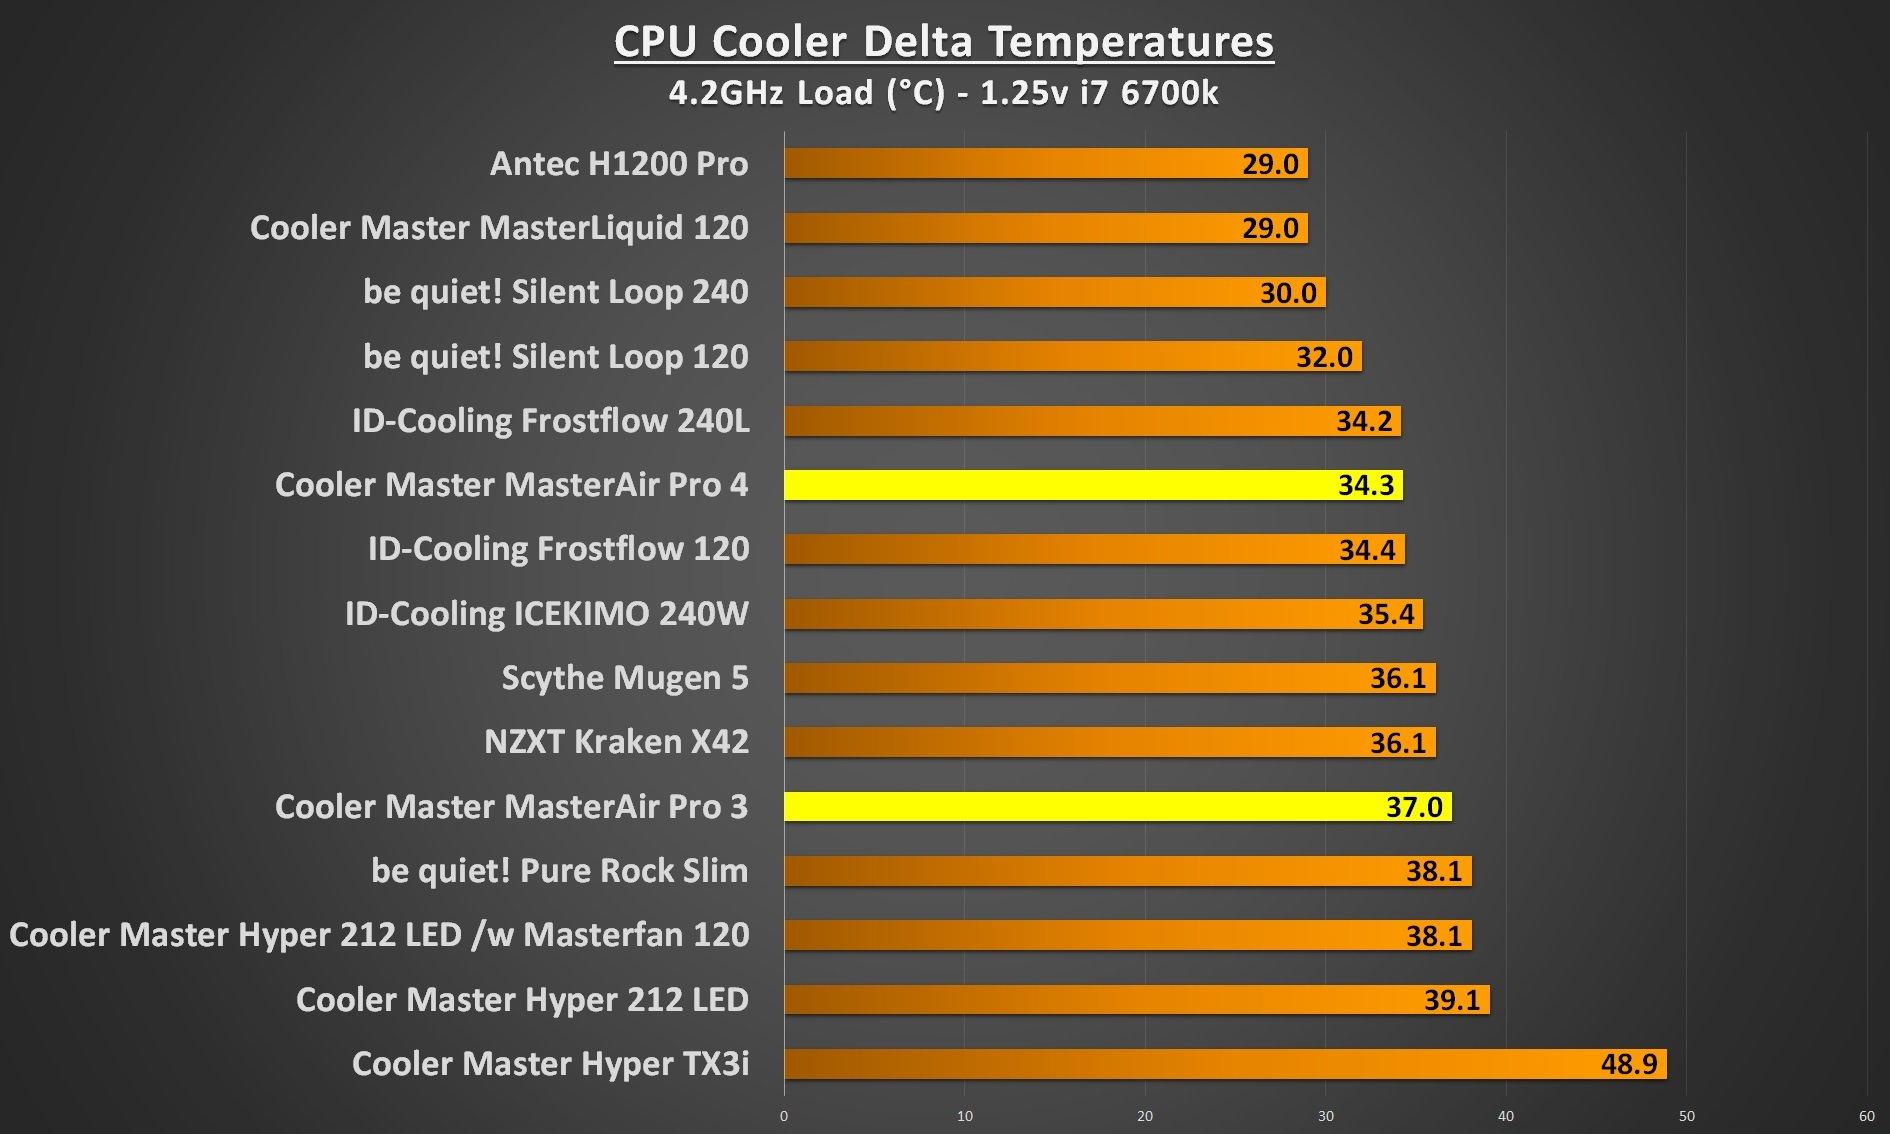 cooler master masterair pro 4.2Ghz load